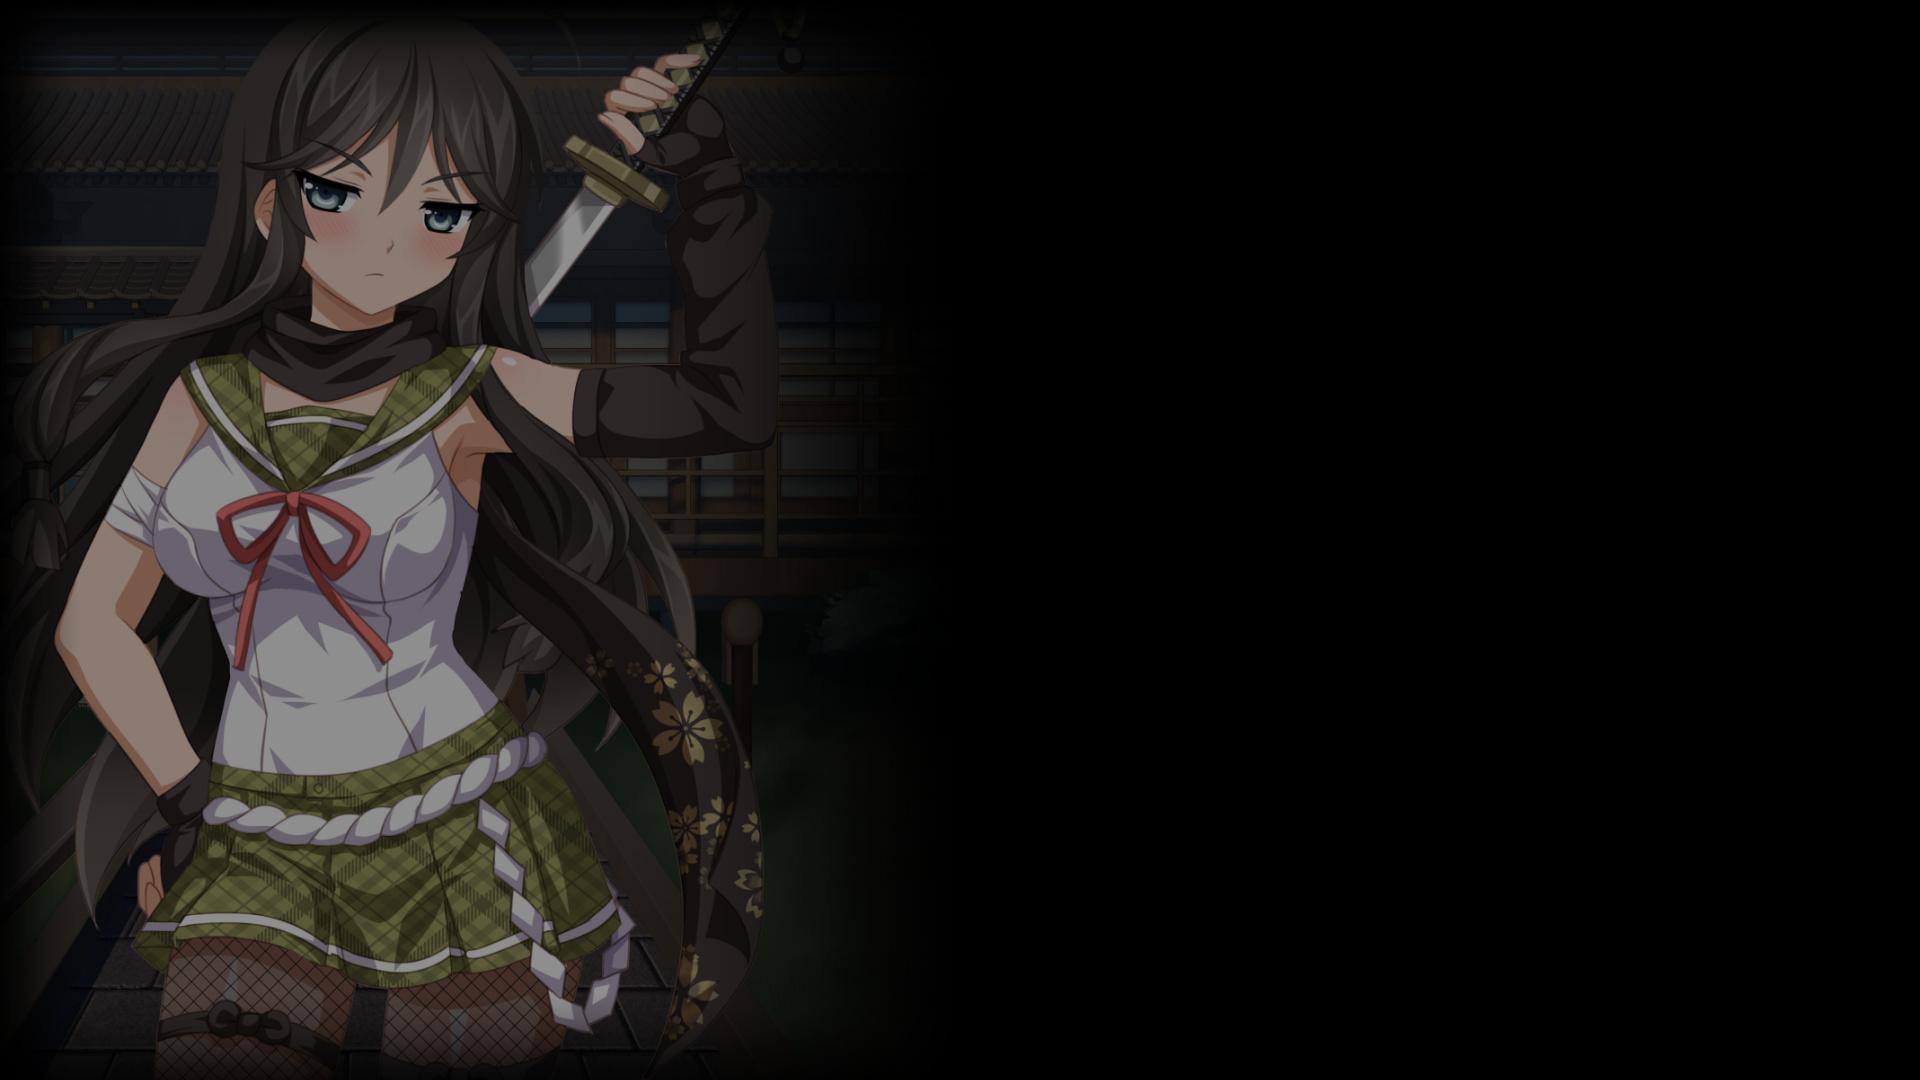 Image - Sakura Spirit Background Miyu.jpg